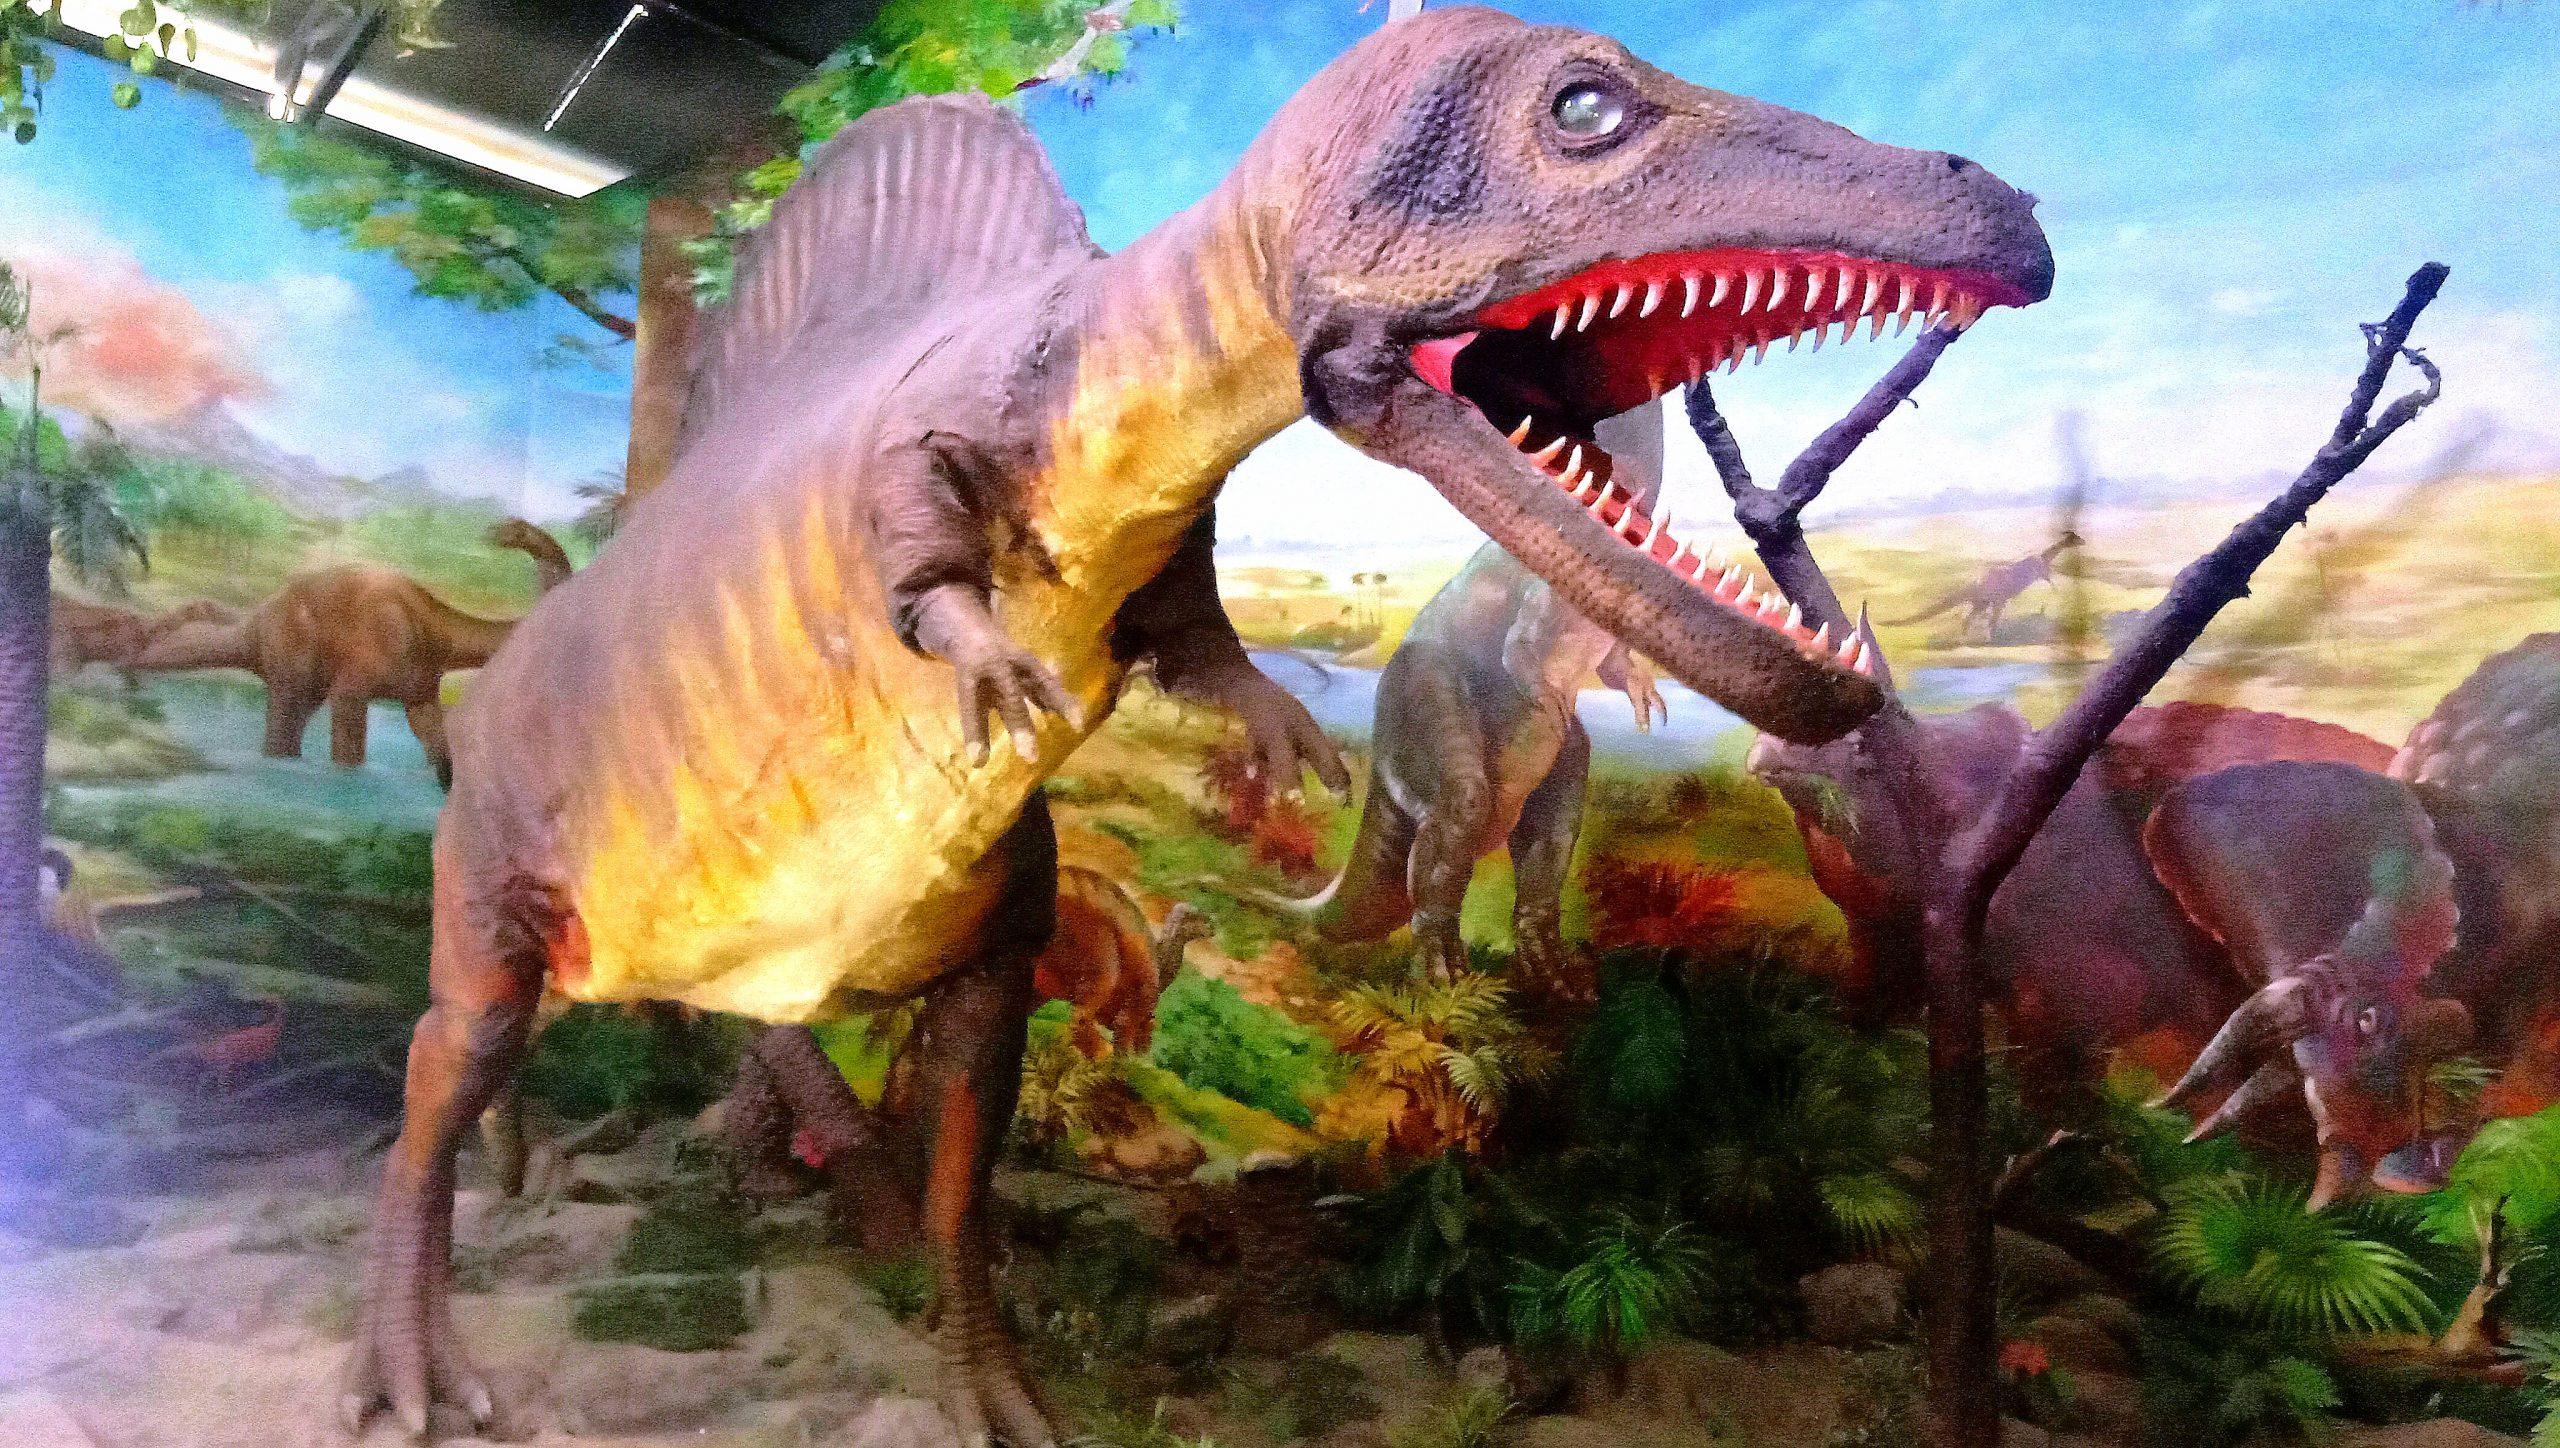 A statue of Dinosaur